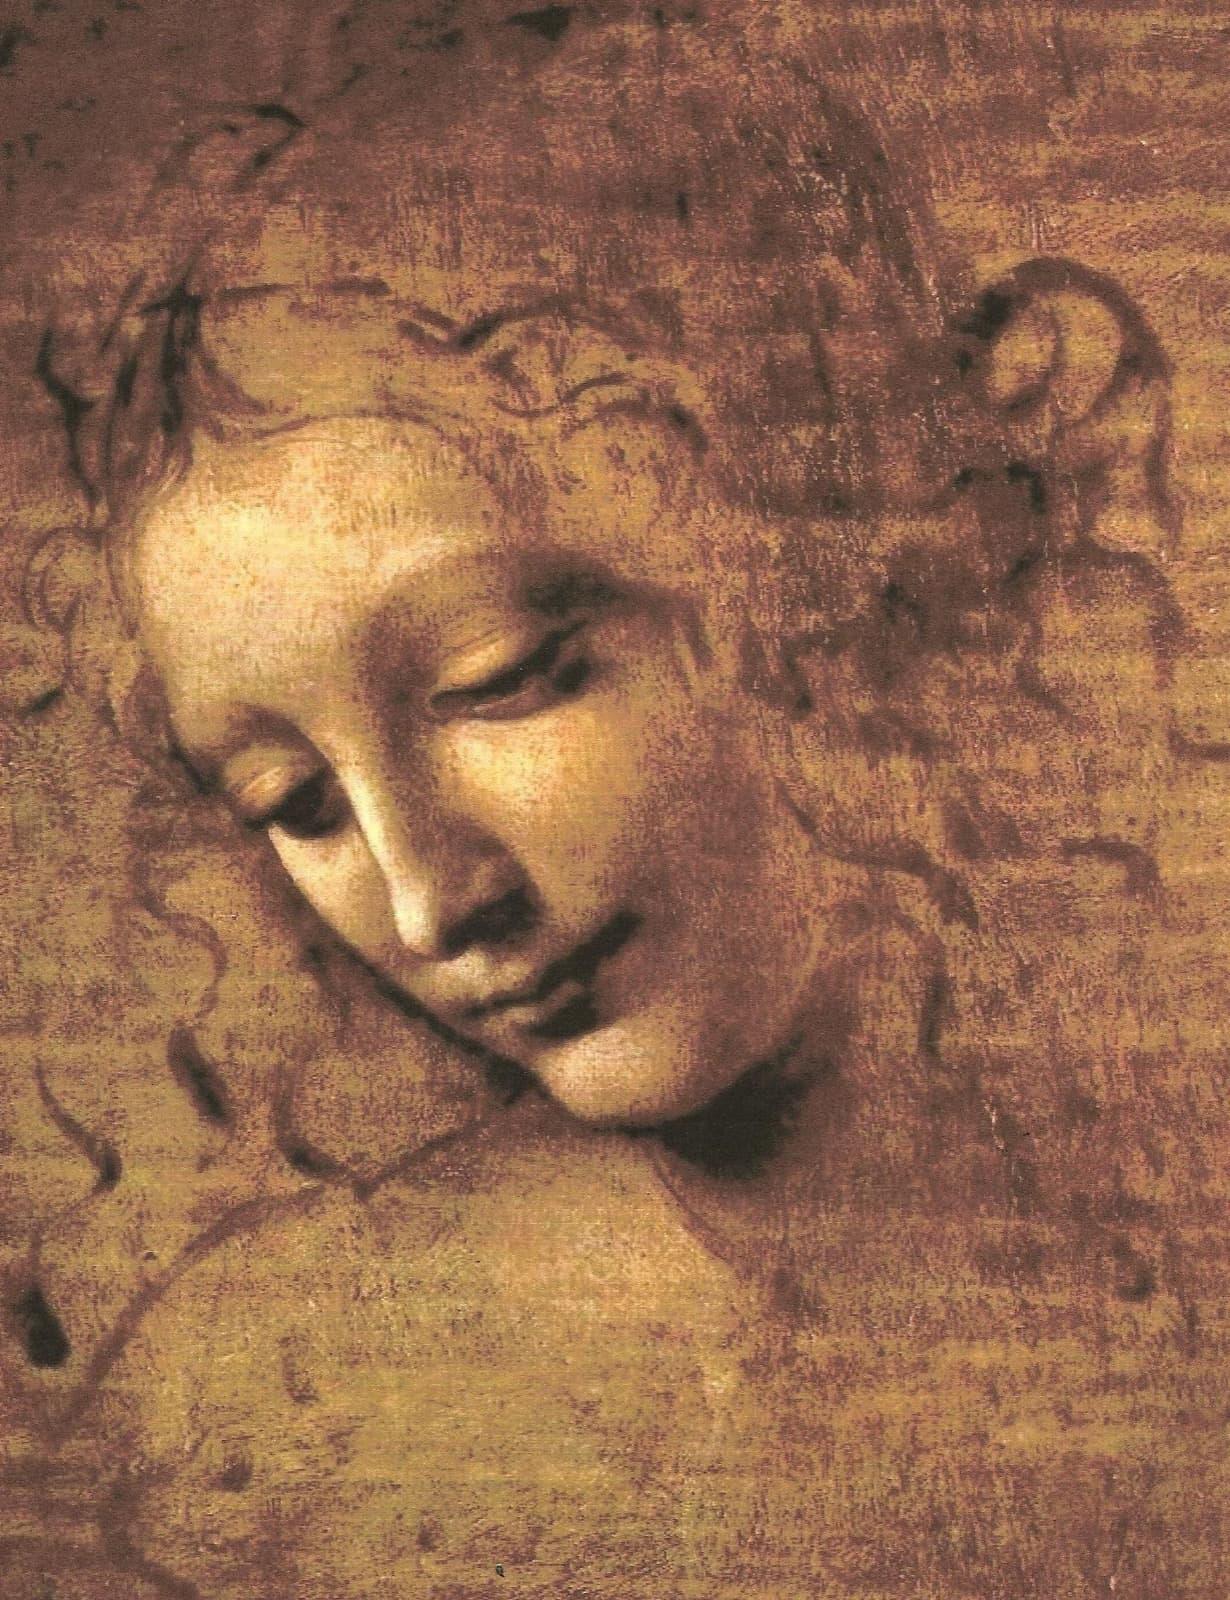 Leonardo da Vinci's La Scapigliata